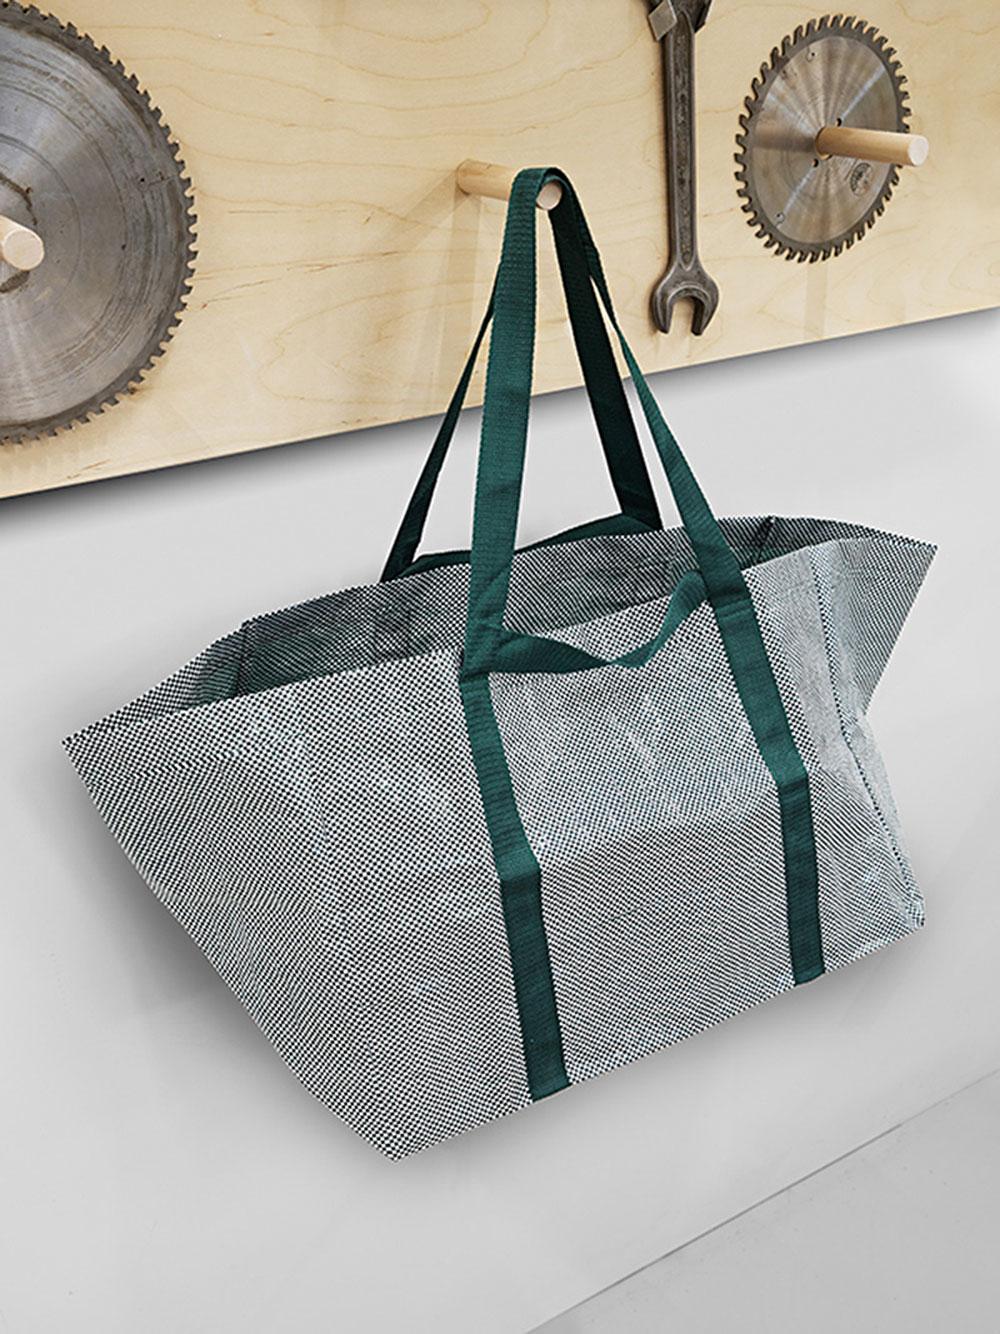 Ikea-Hay-Collaboration-2017-Design-1